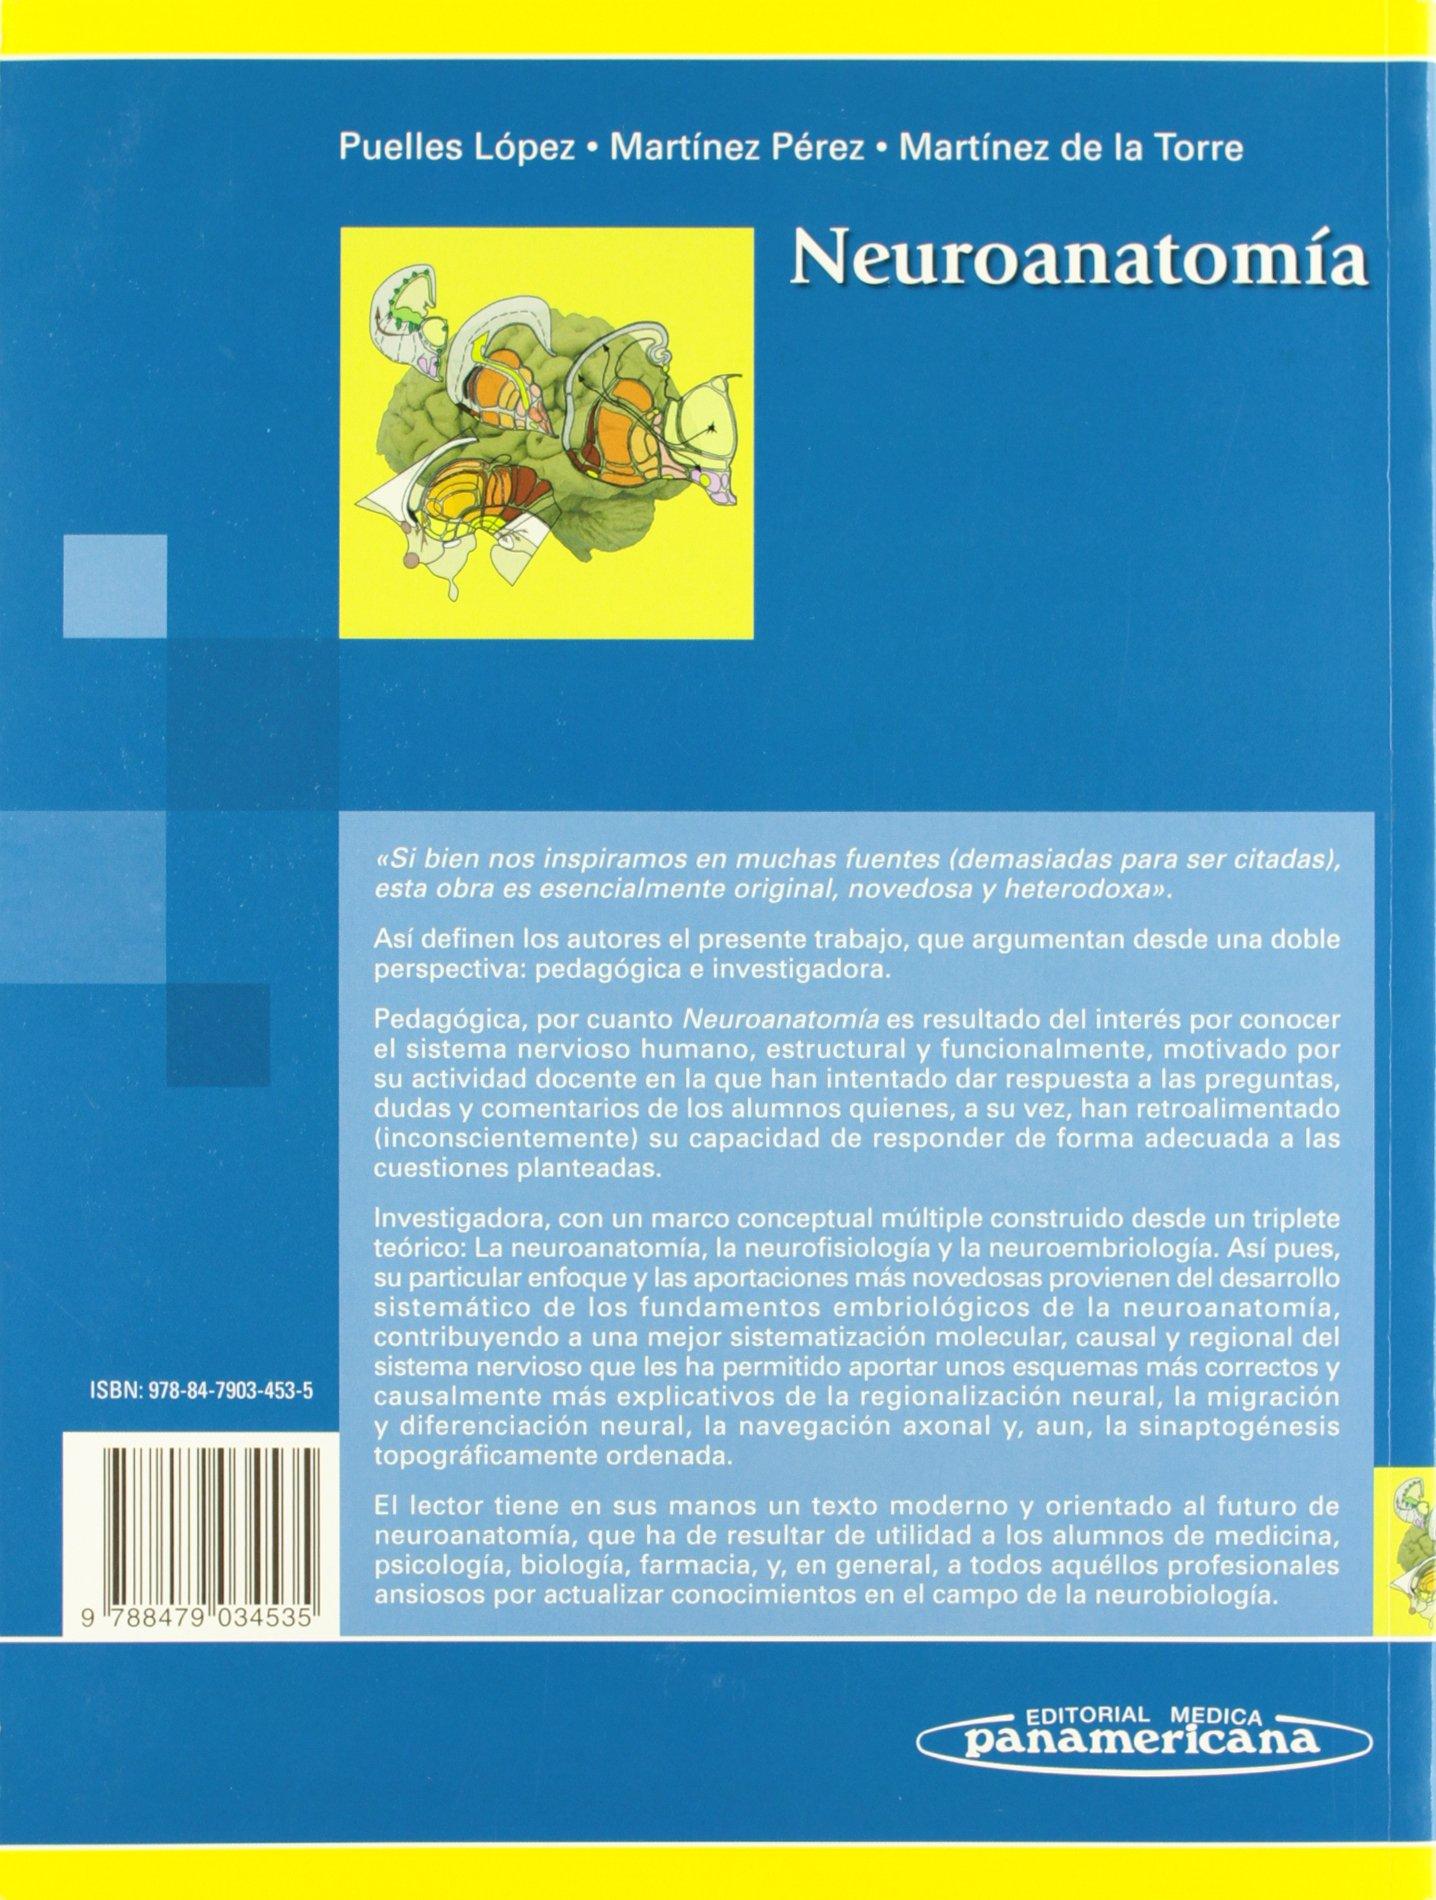 PUELLES NEUROANATOMIA EPUB